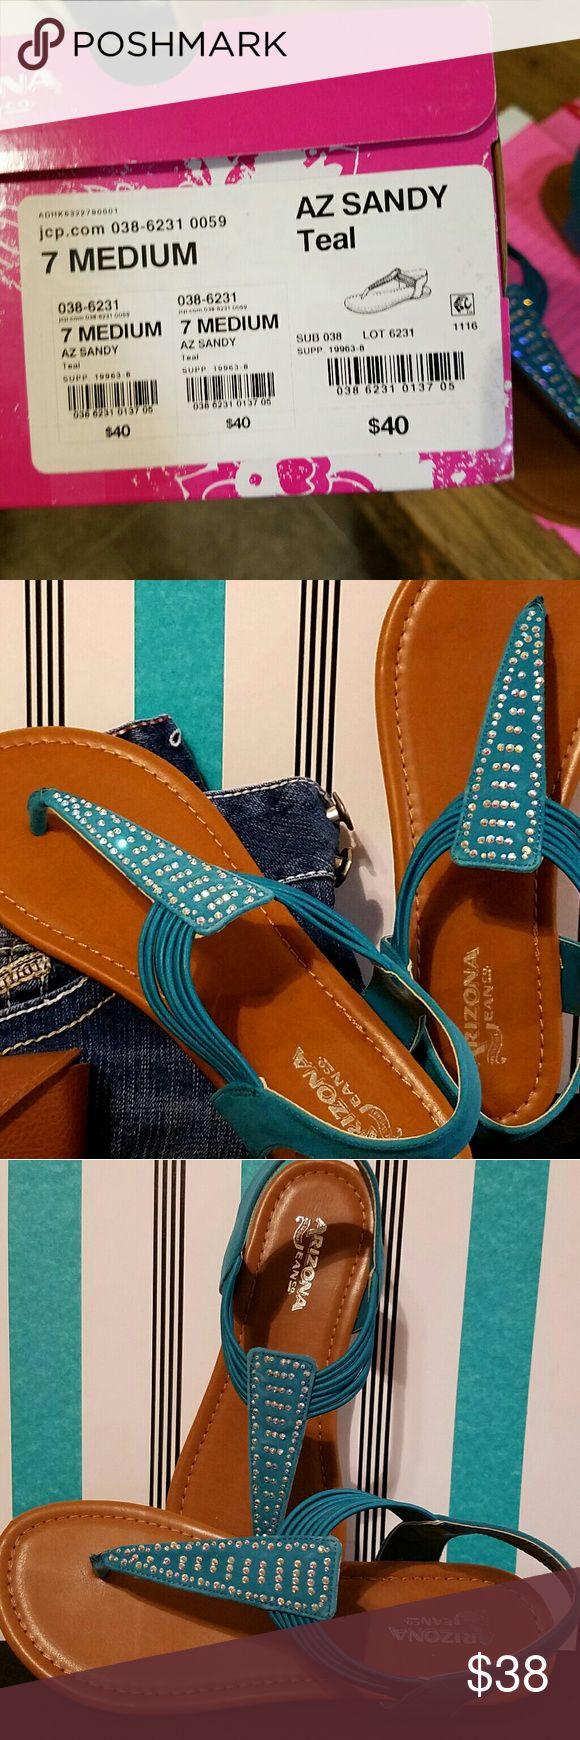 👣🛍Teal sandals 👣🛍 Teal sandals nwt  soooooo cute!! Arizona Jean Company Shoes Sandals